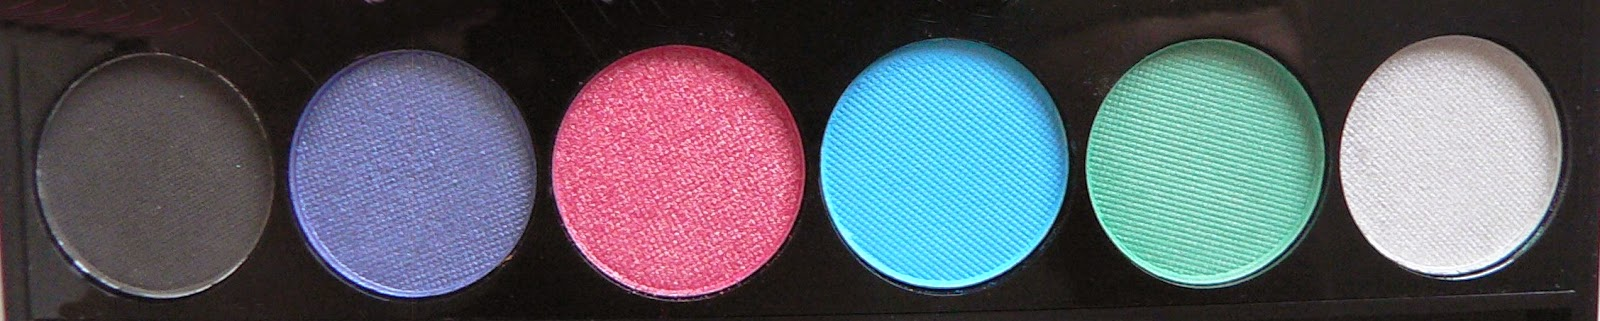 Review, swatch, sleek, candy, eyeshadow, oogschaduw, palette